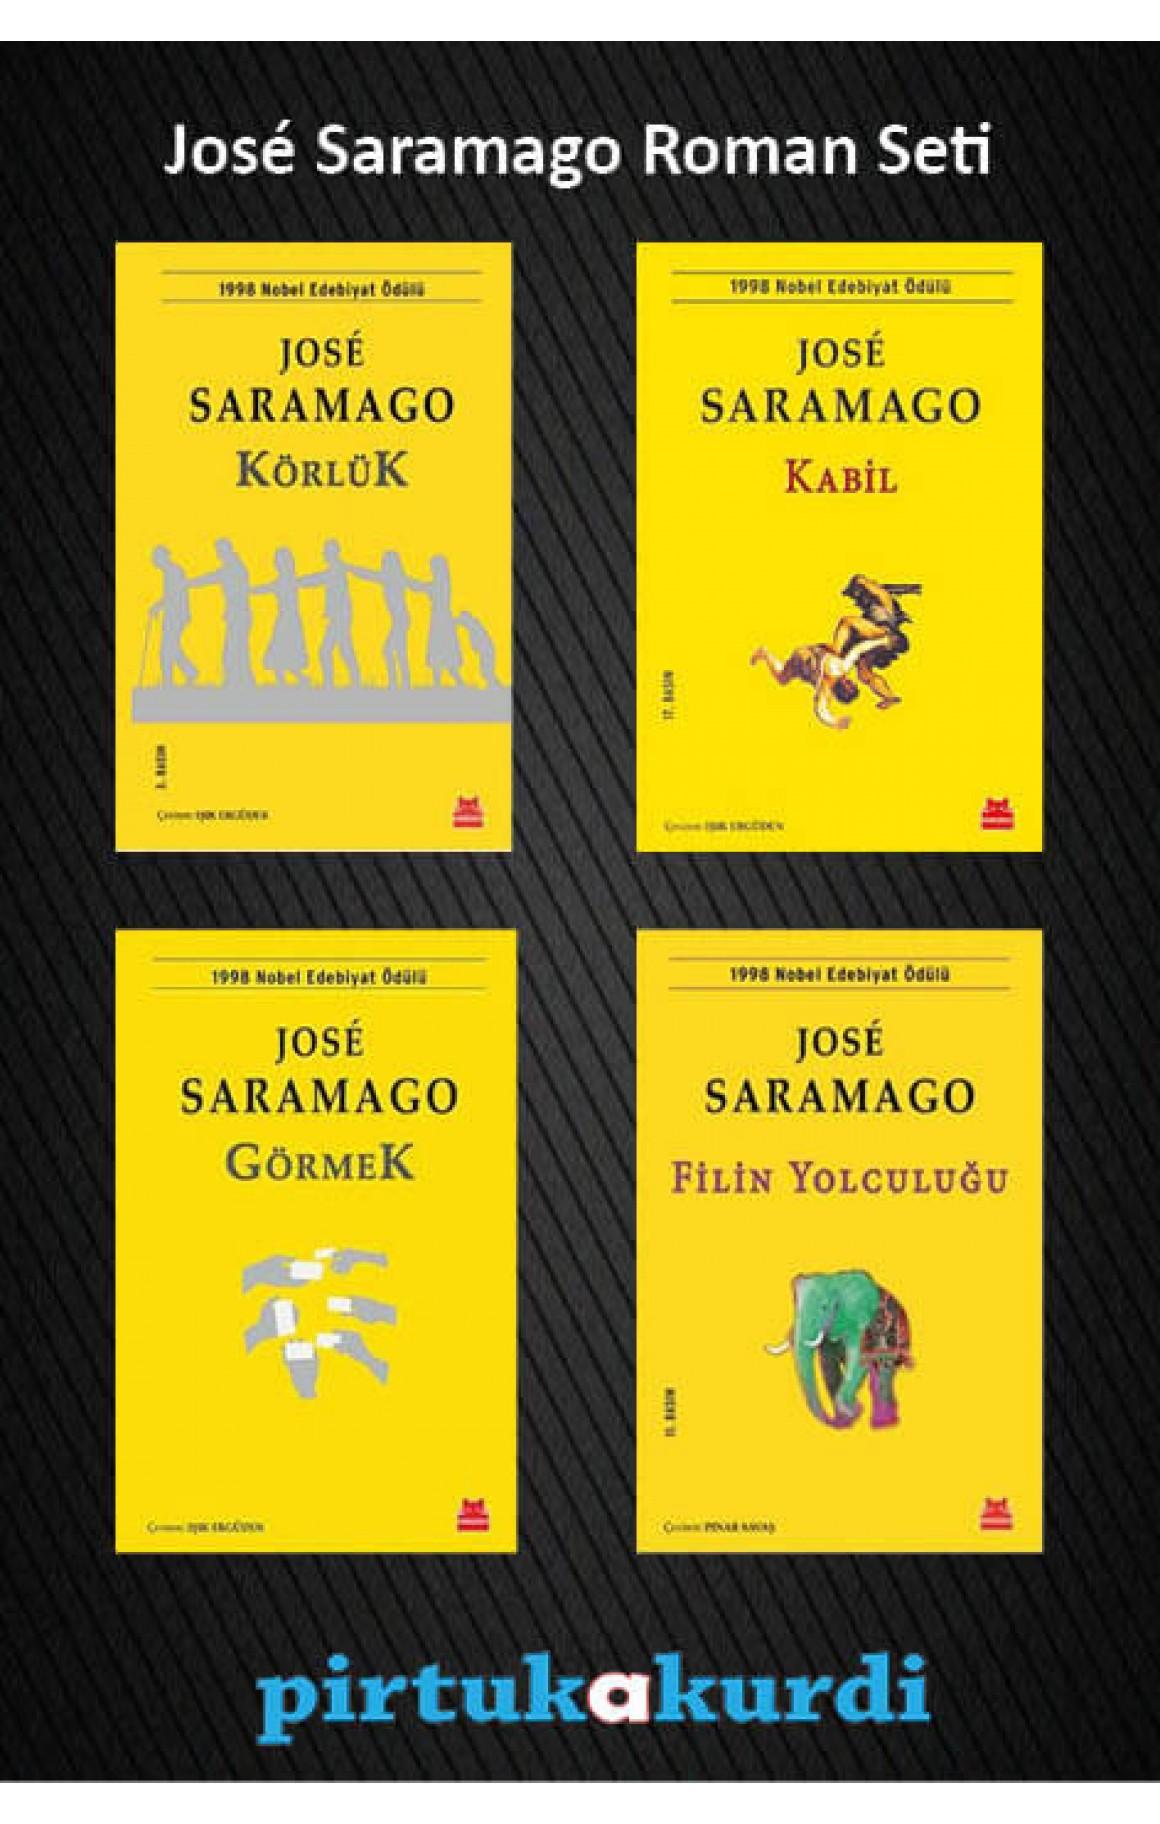 José Saramago Roman Seti